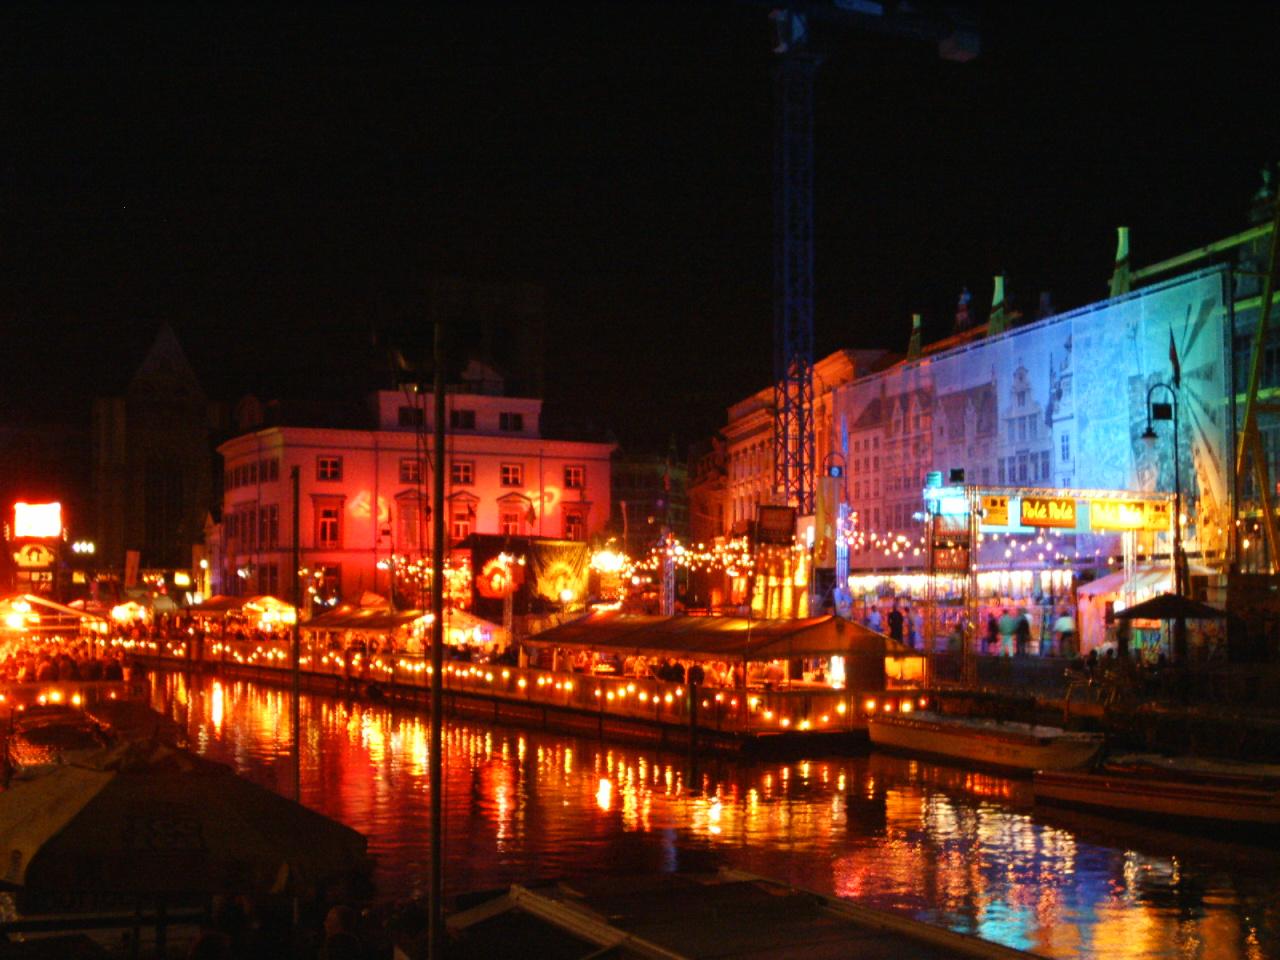 festival pole pole gante 2004